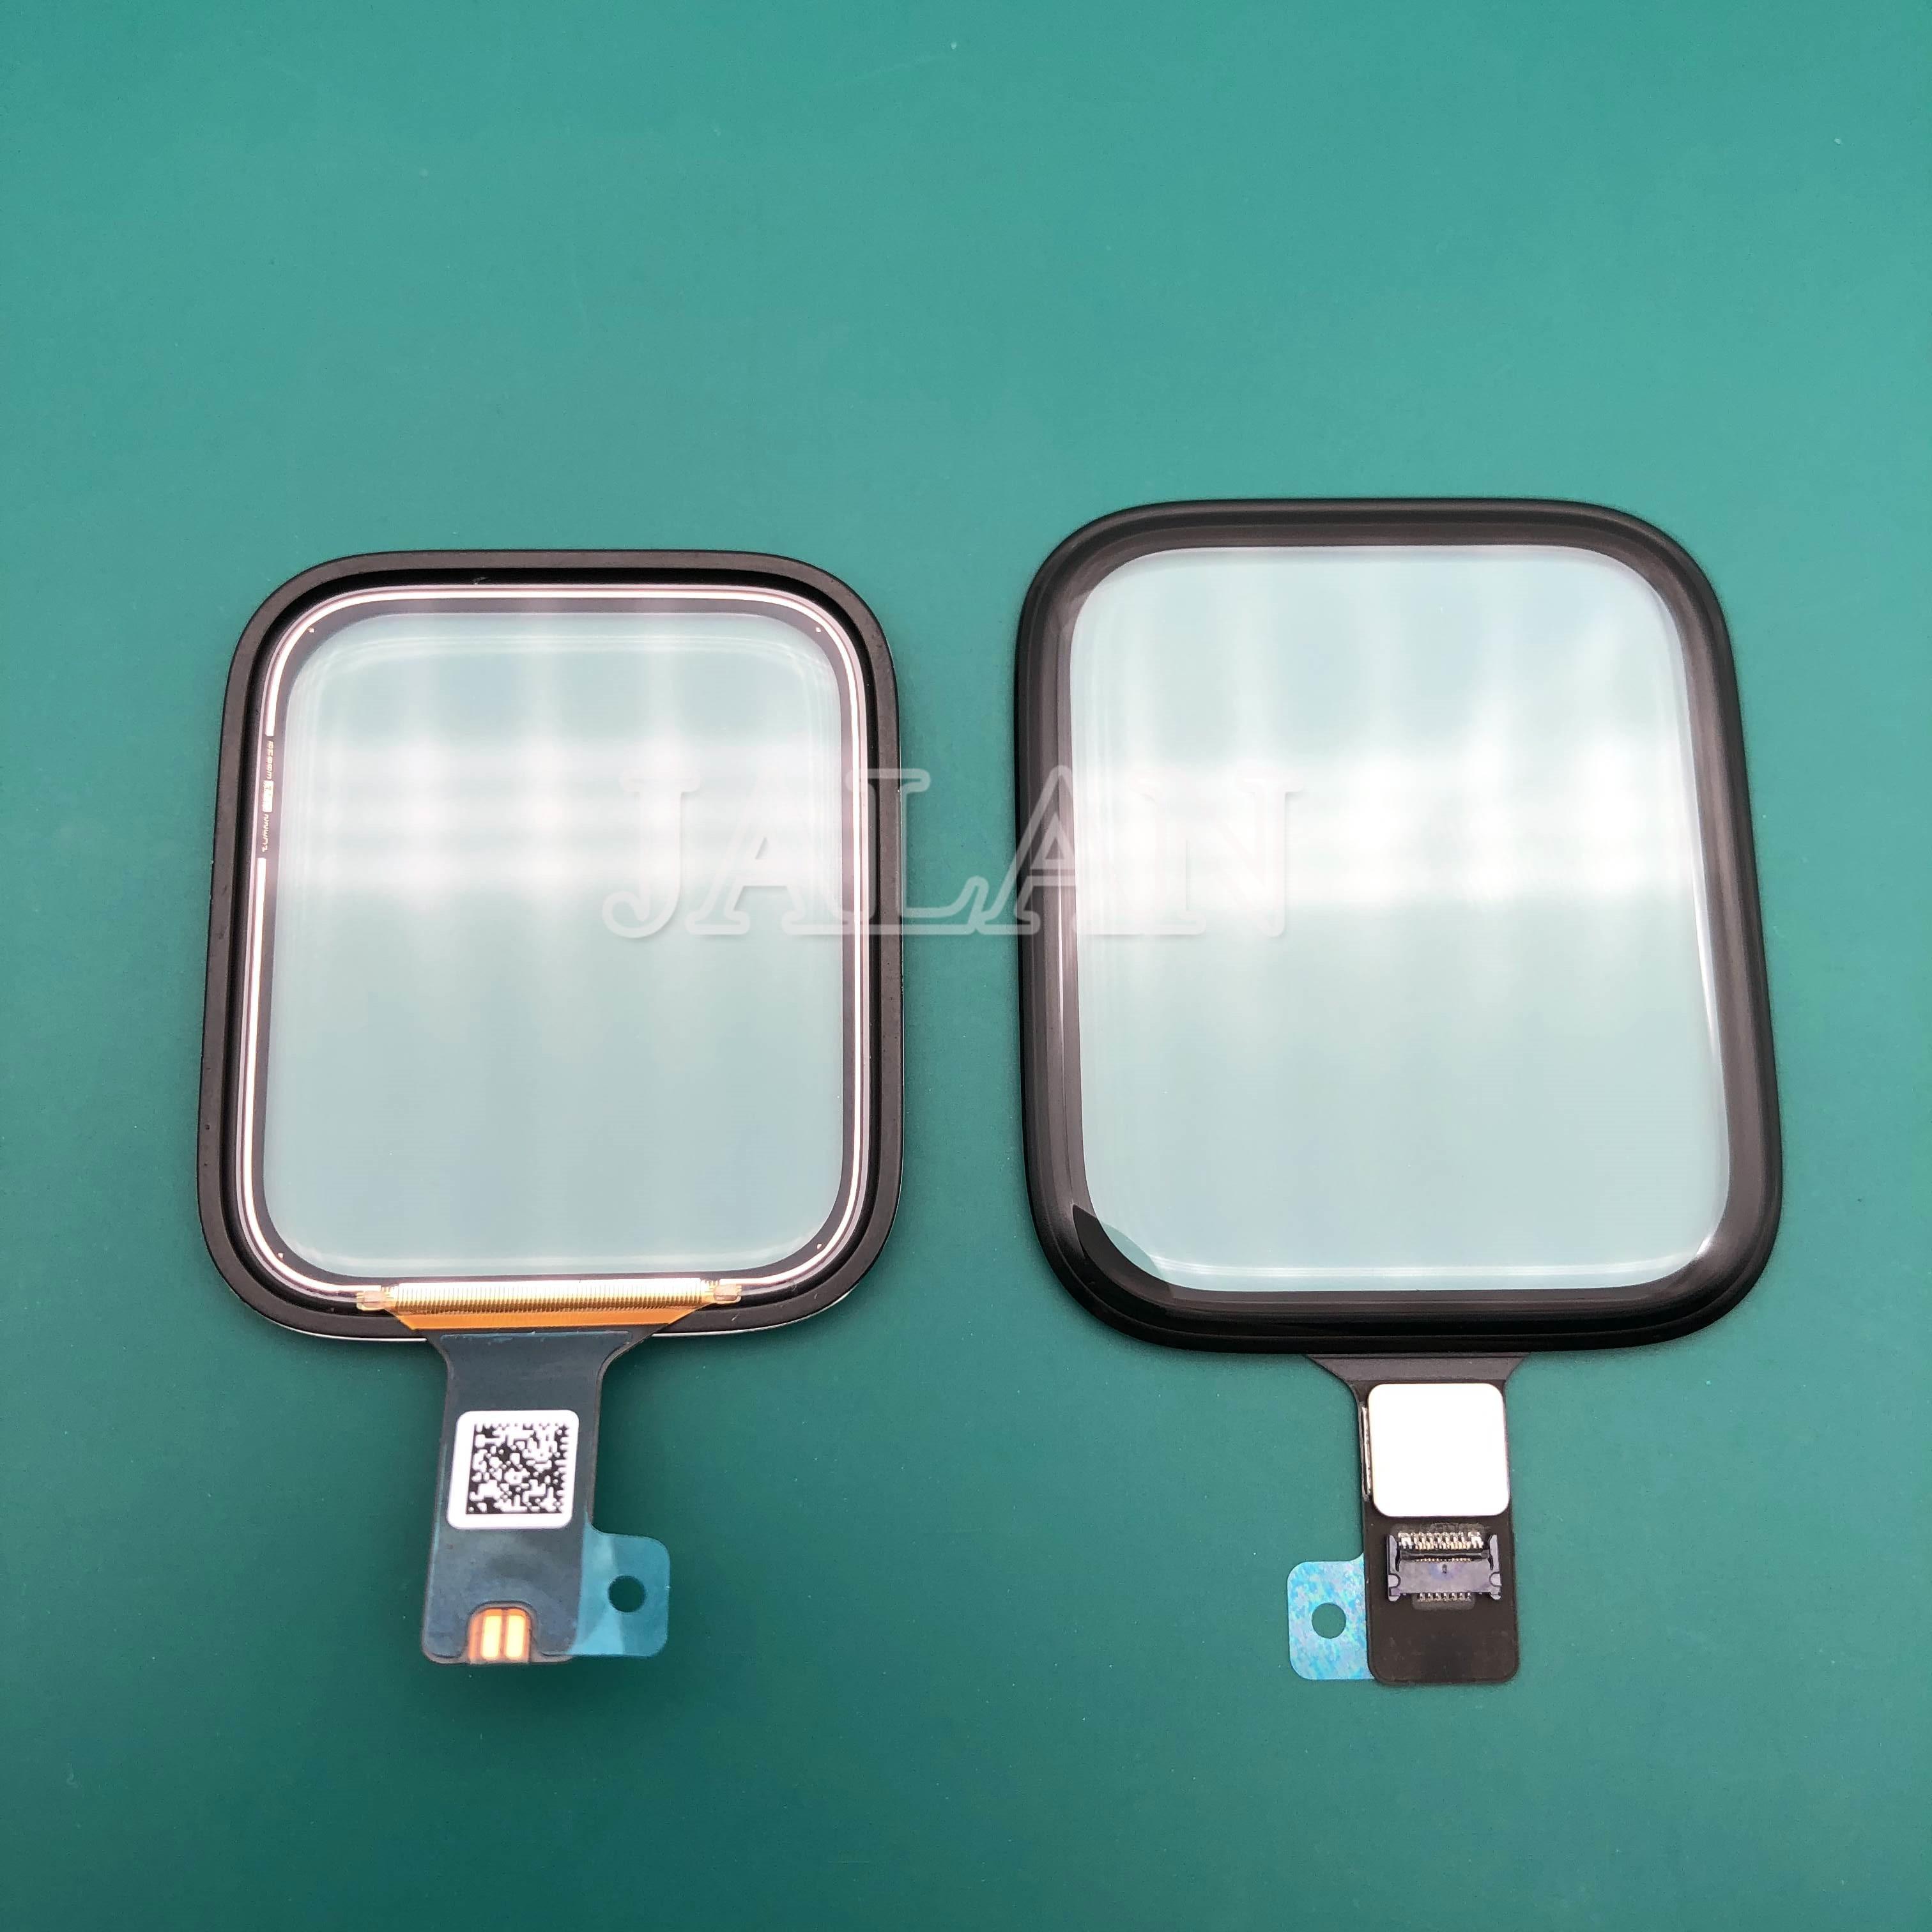 JALAN New touch screen for Apple Watch Series 4 44mm 42mm watch digitizer touchscreen outer glass